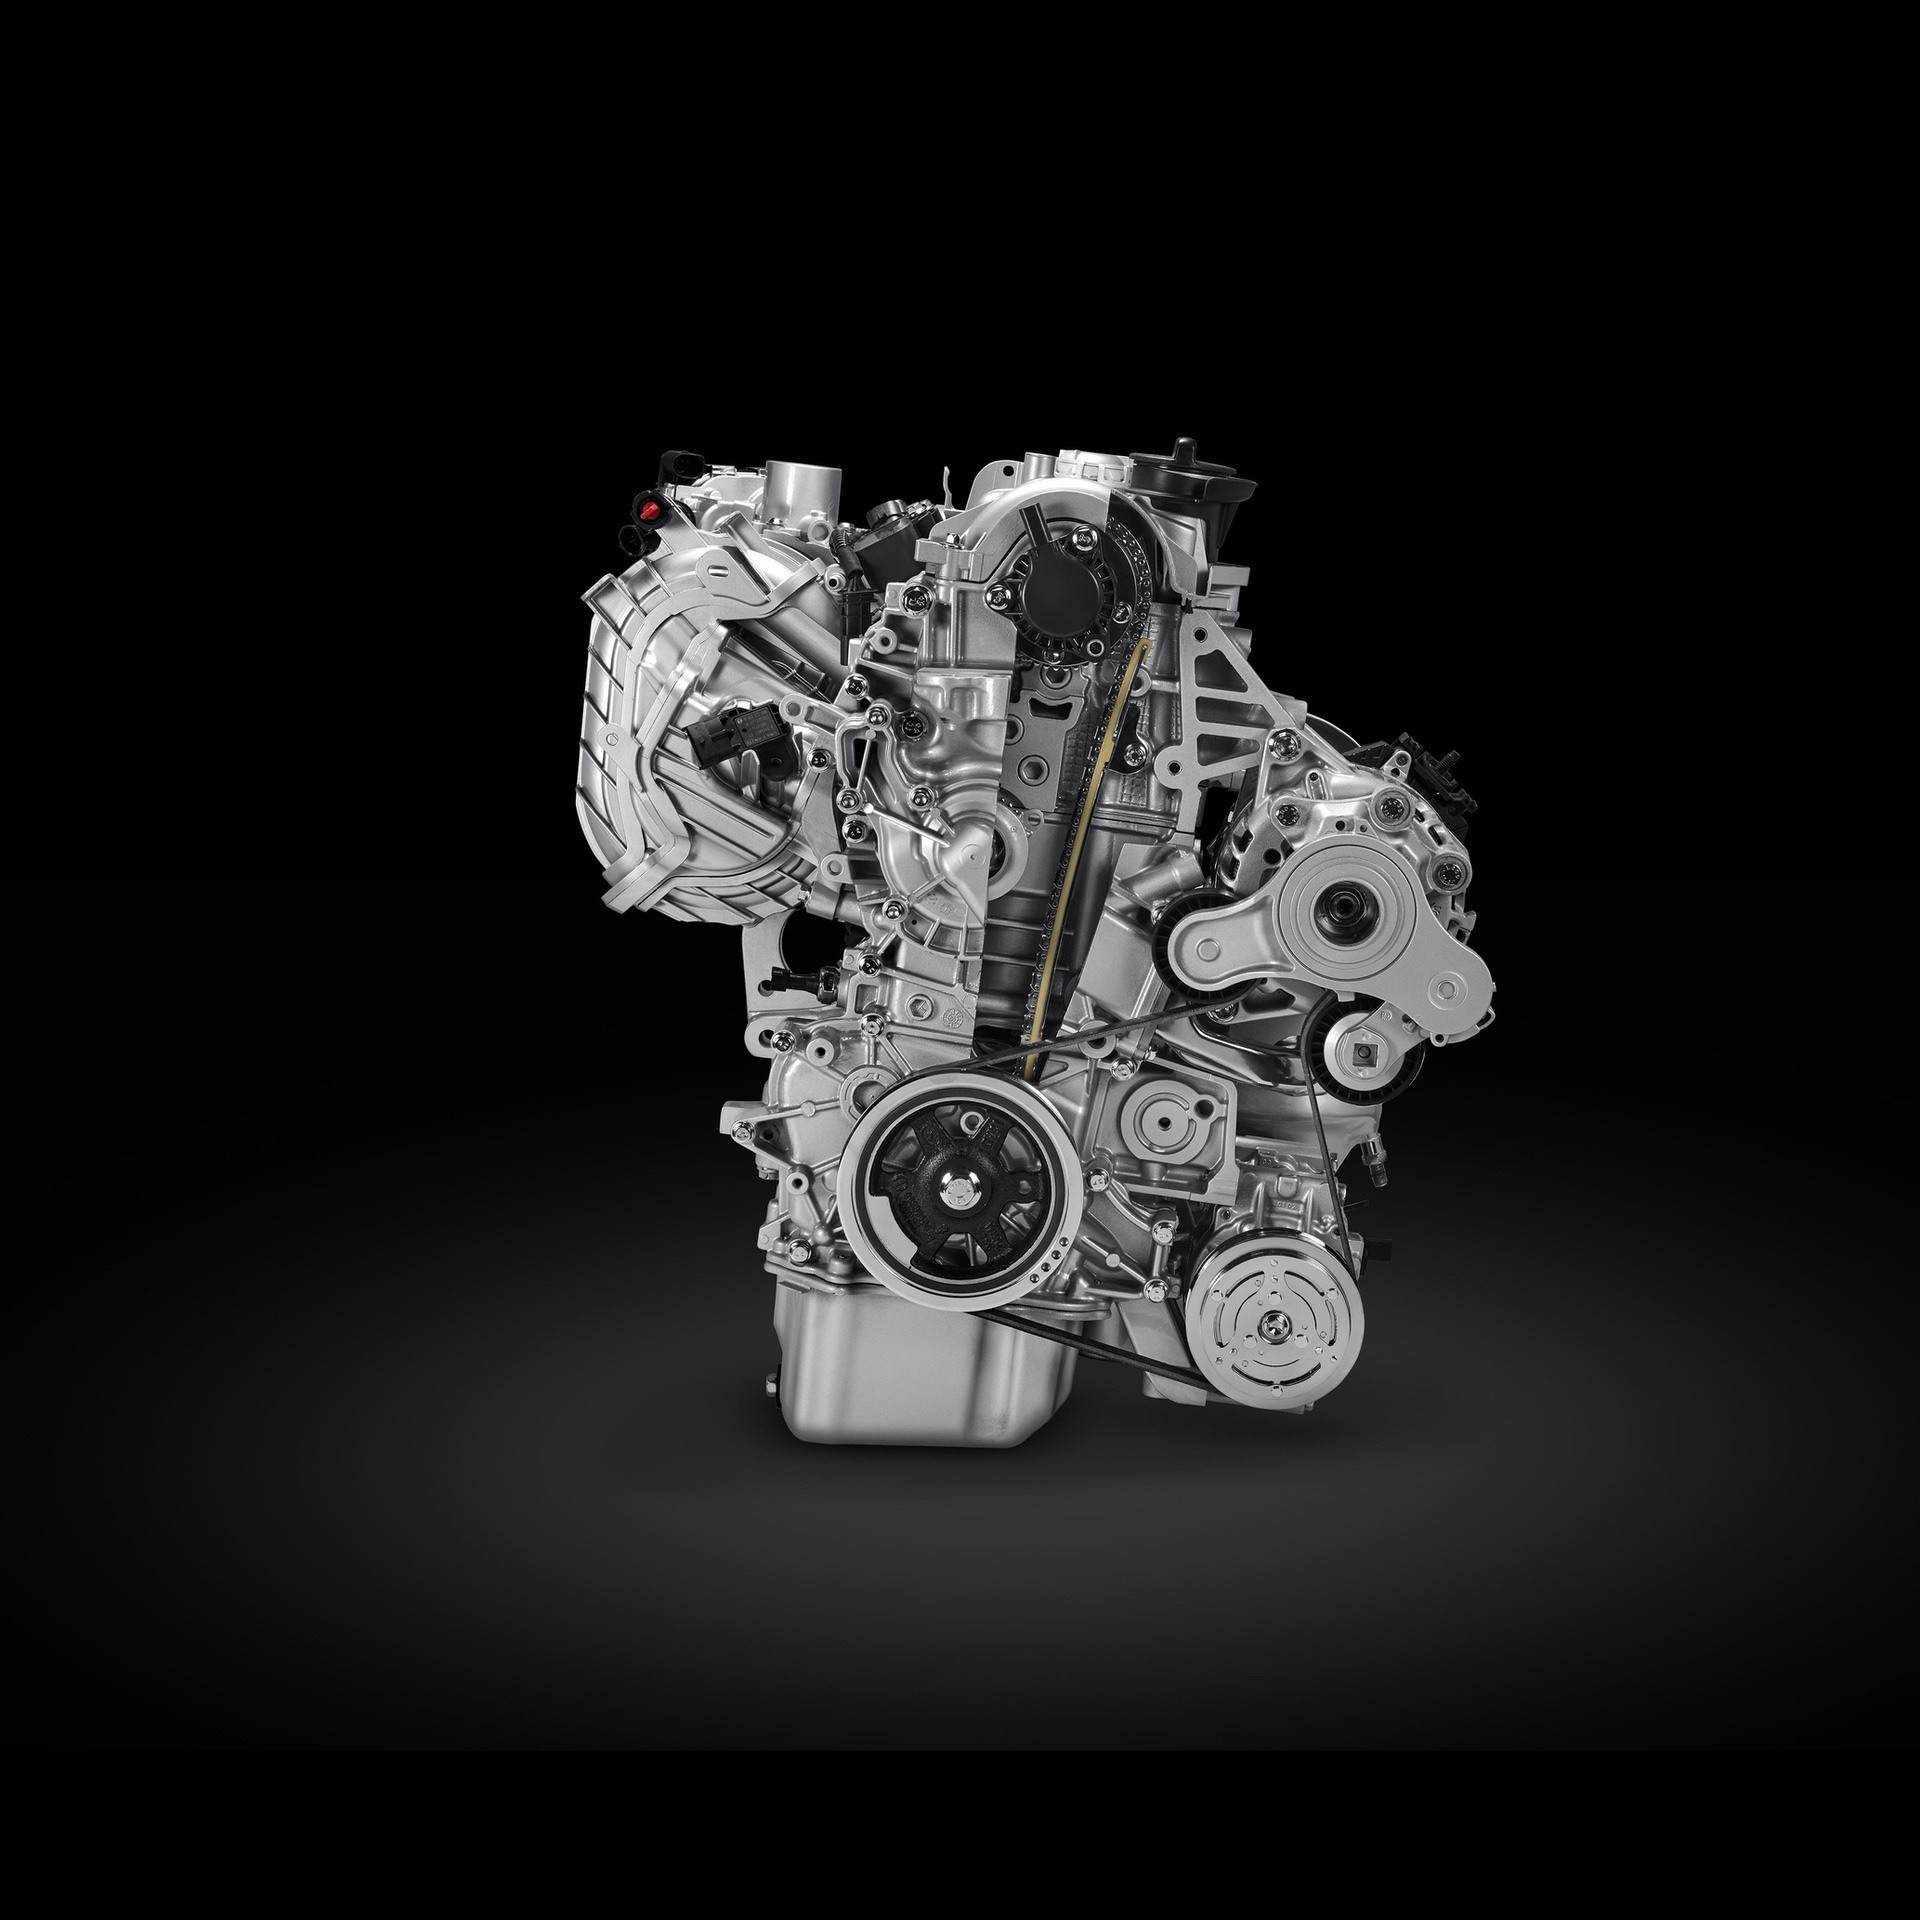 200108_Fiat_Mild-Hybrid-Engine_08